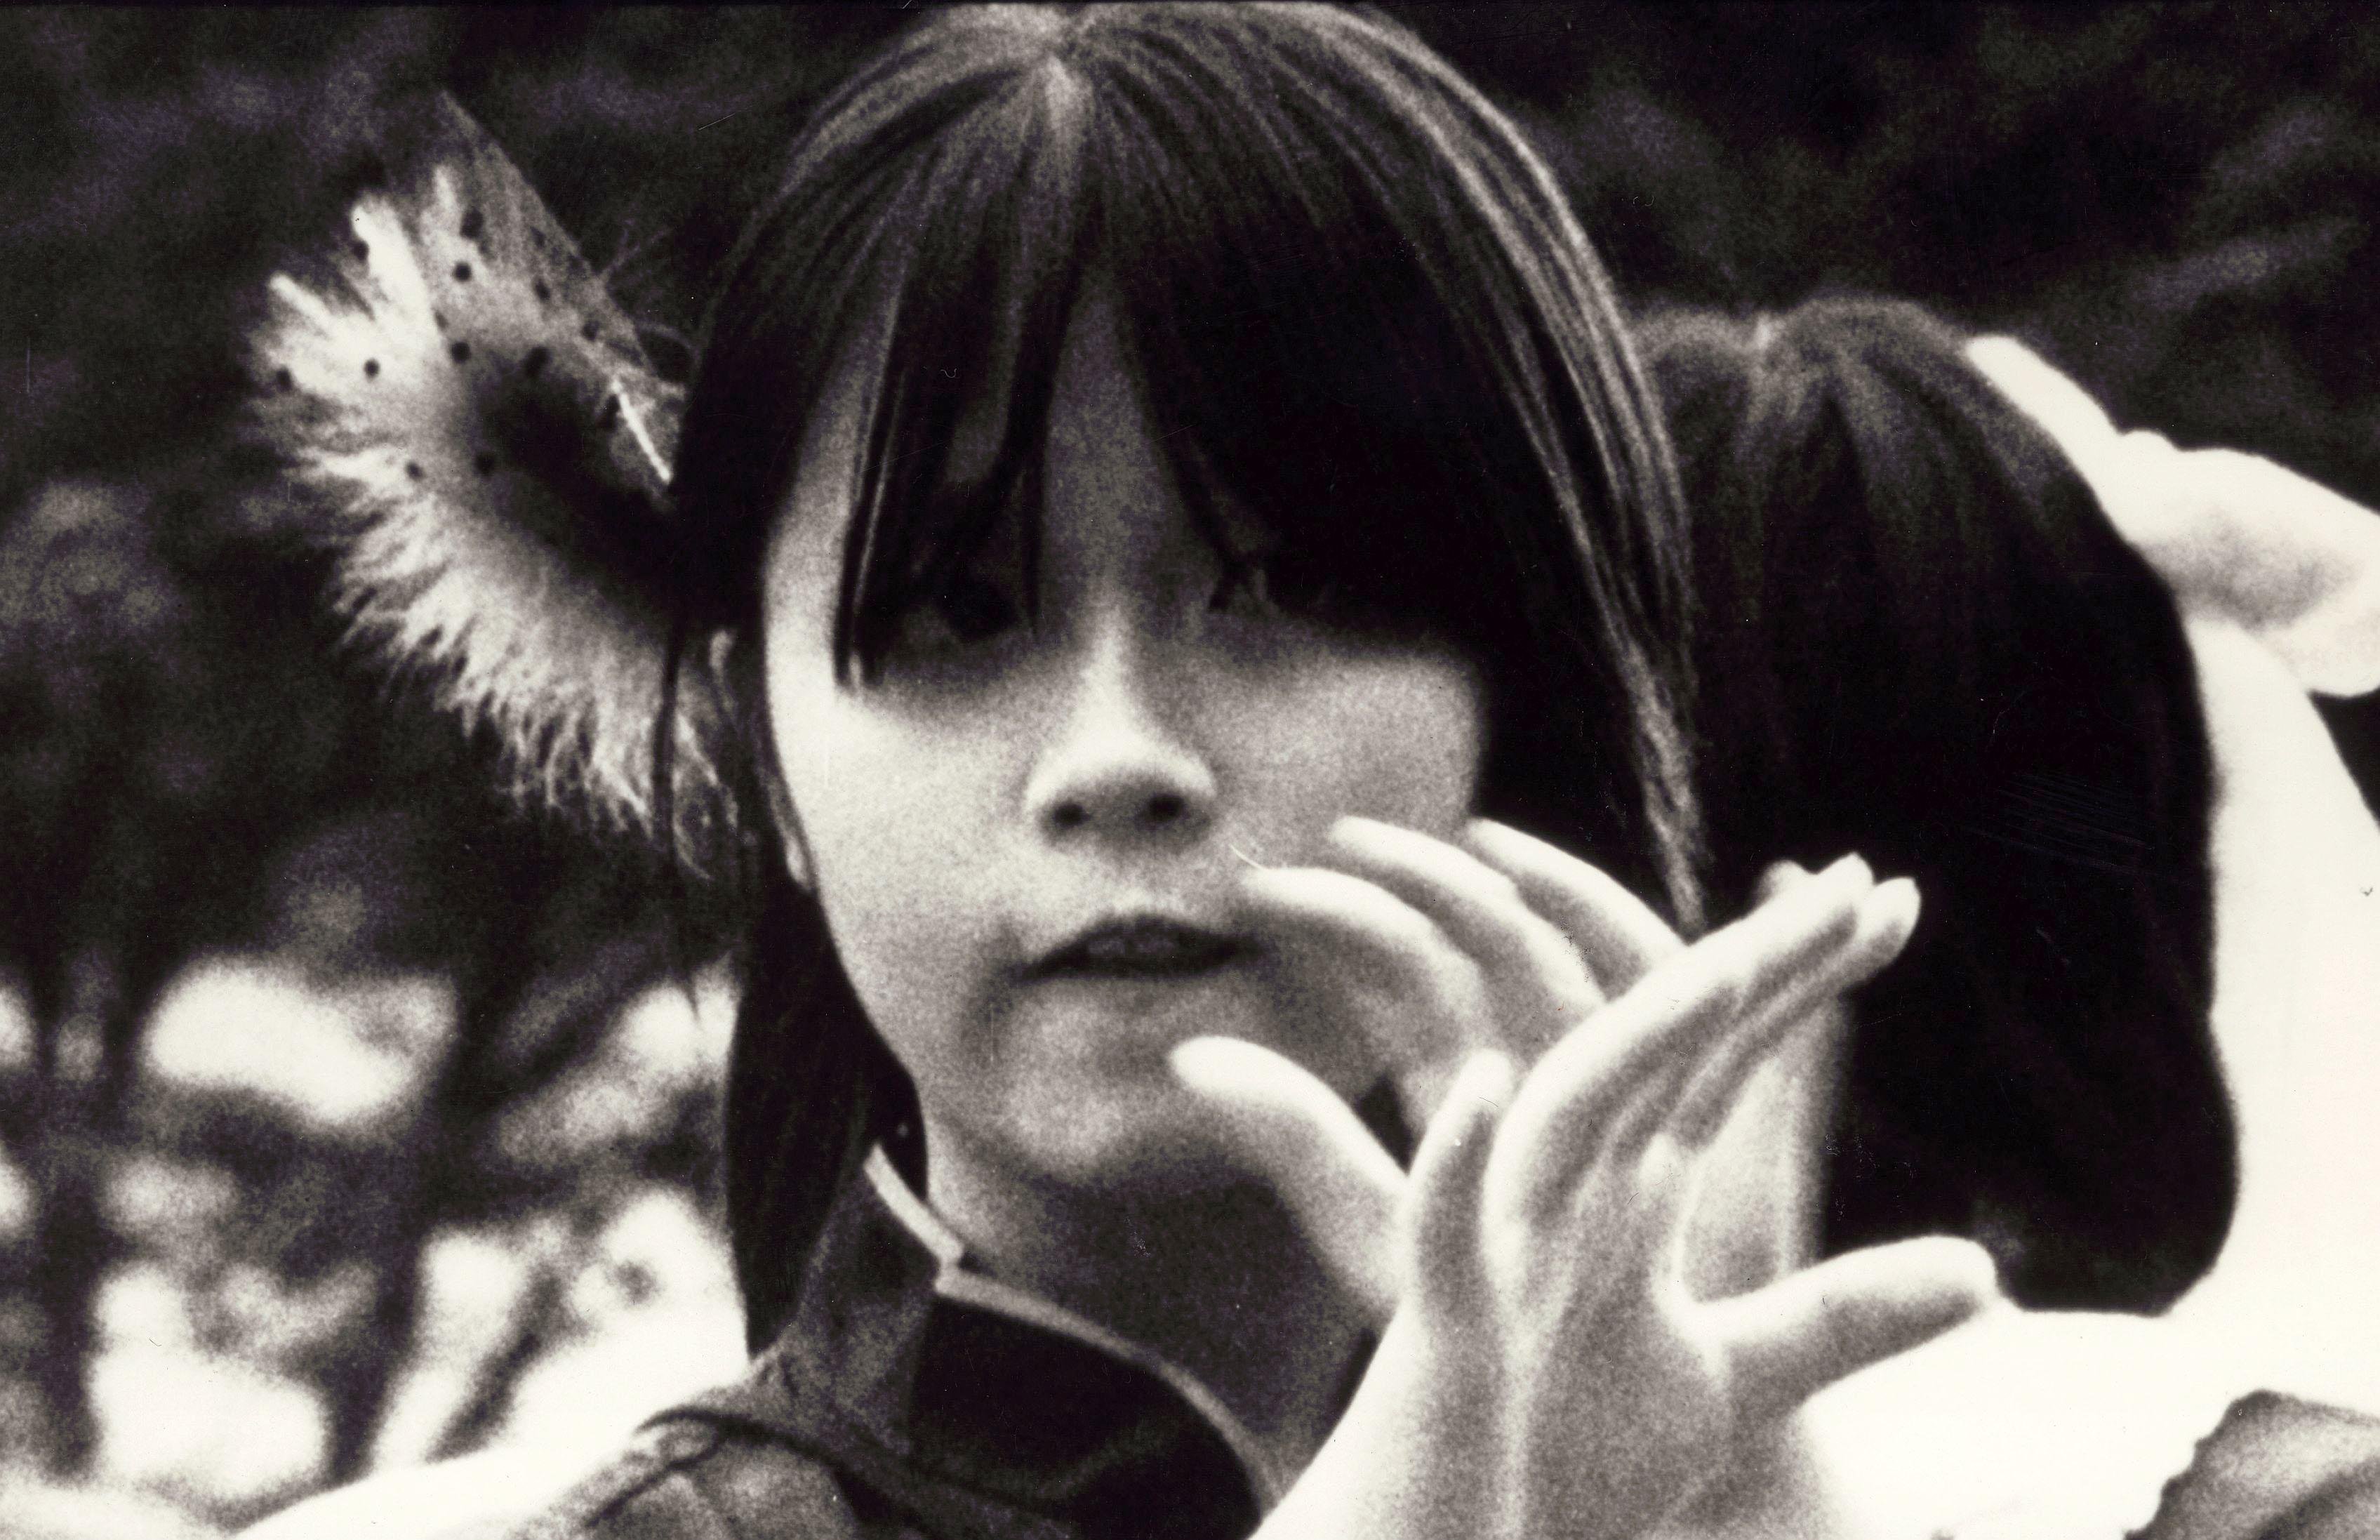 Still from Chris Marker's 1982 film 'Sans Soleil'